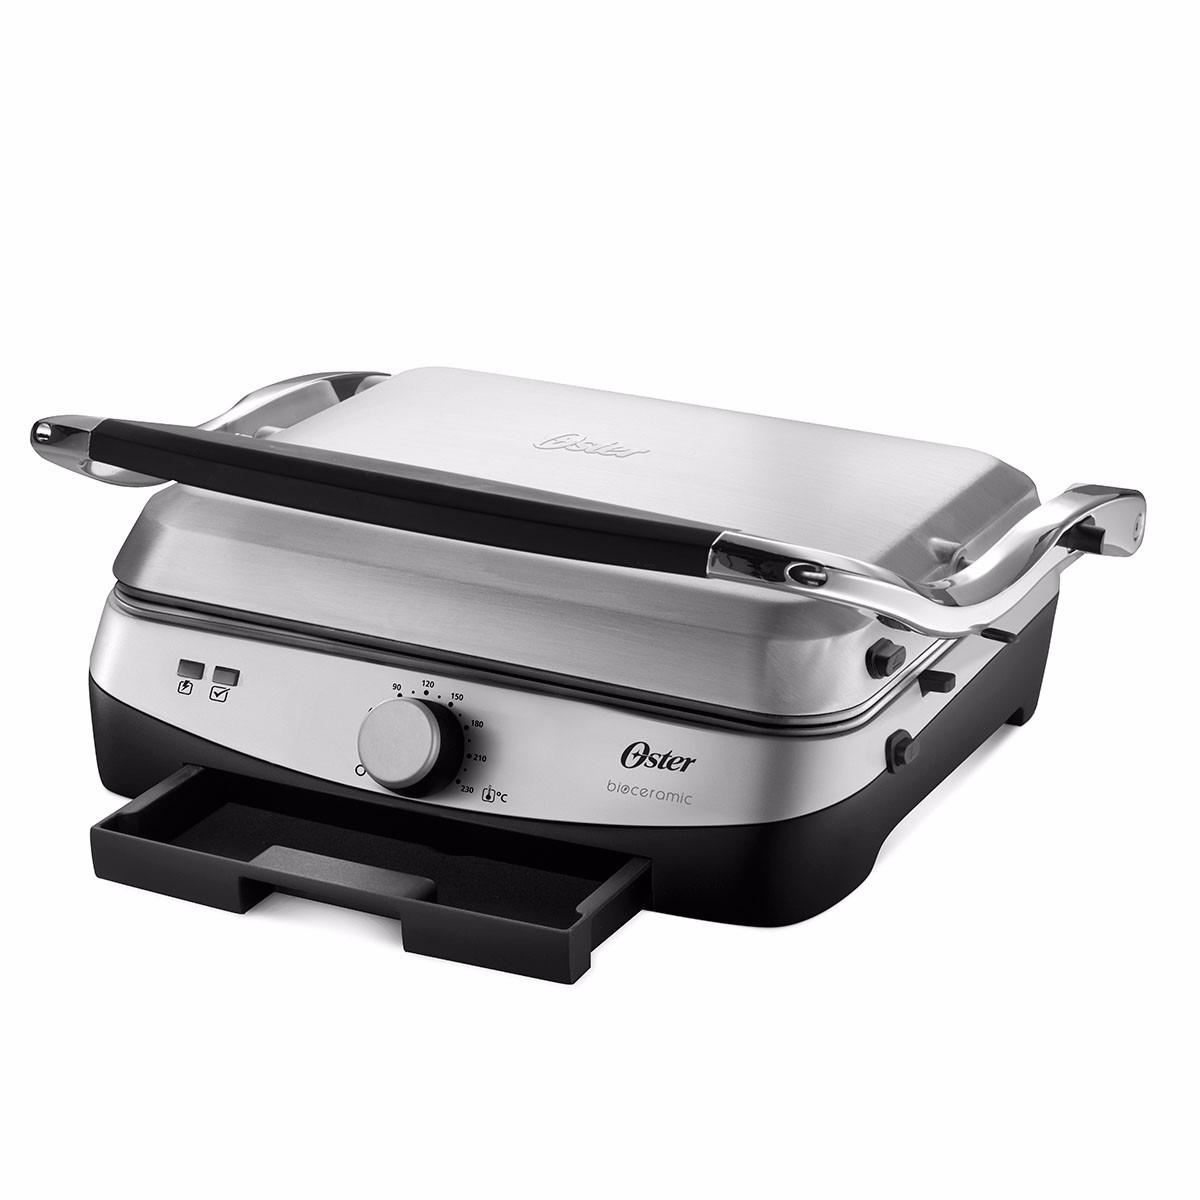 Parrilla electrica prensa plancha grill panini oster acero for Plancha electrica cocina